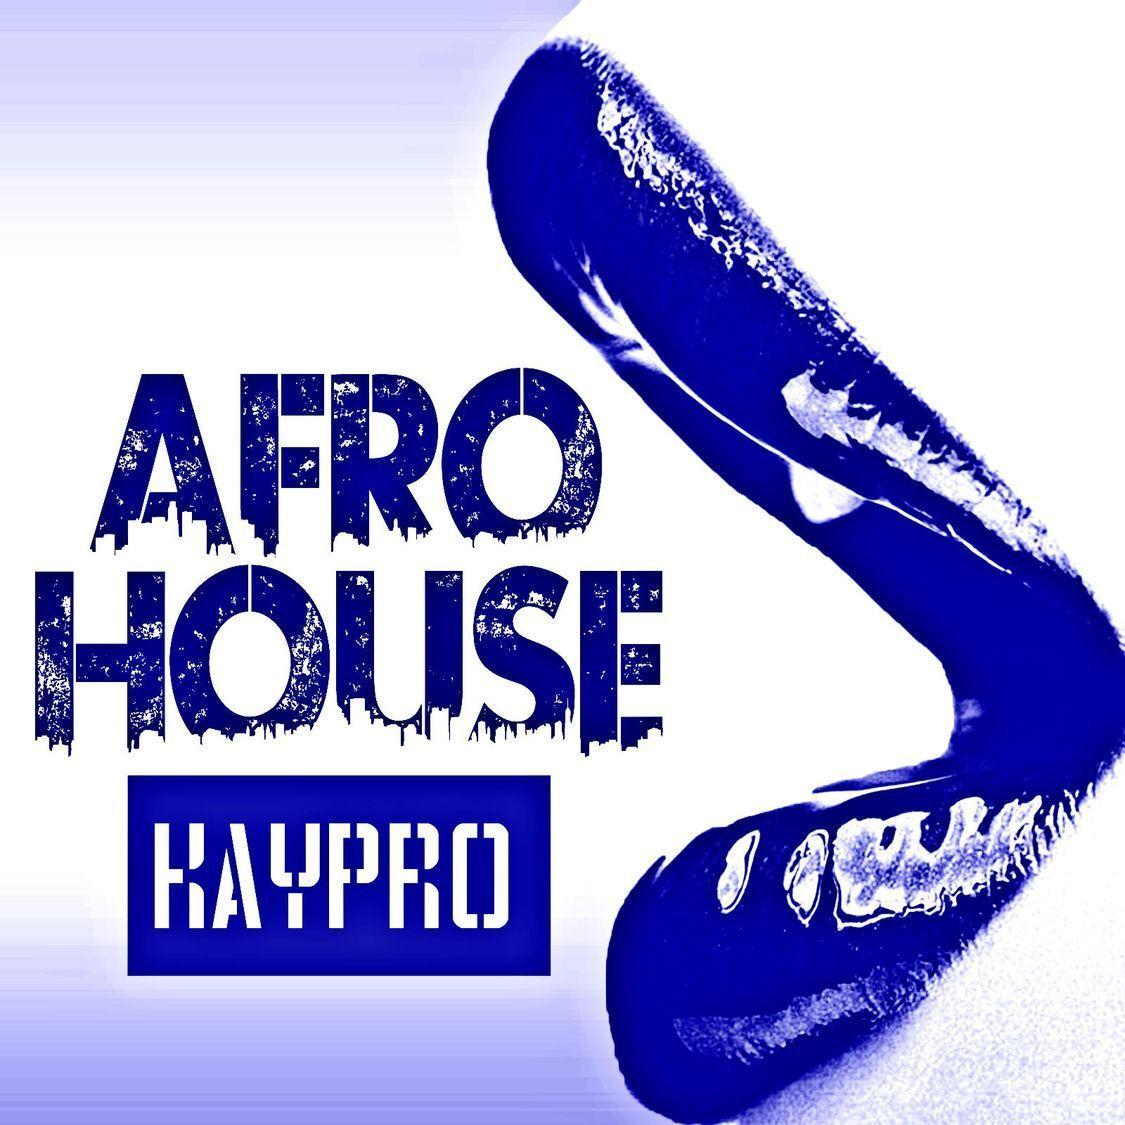 Kaypro reverbnation for Funky house artists